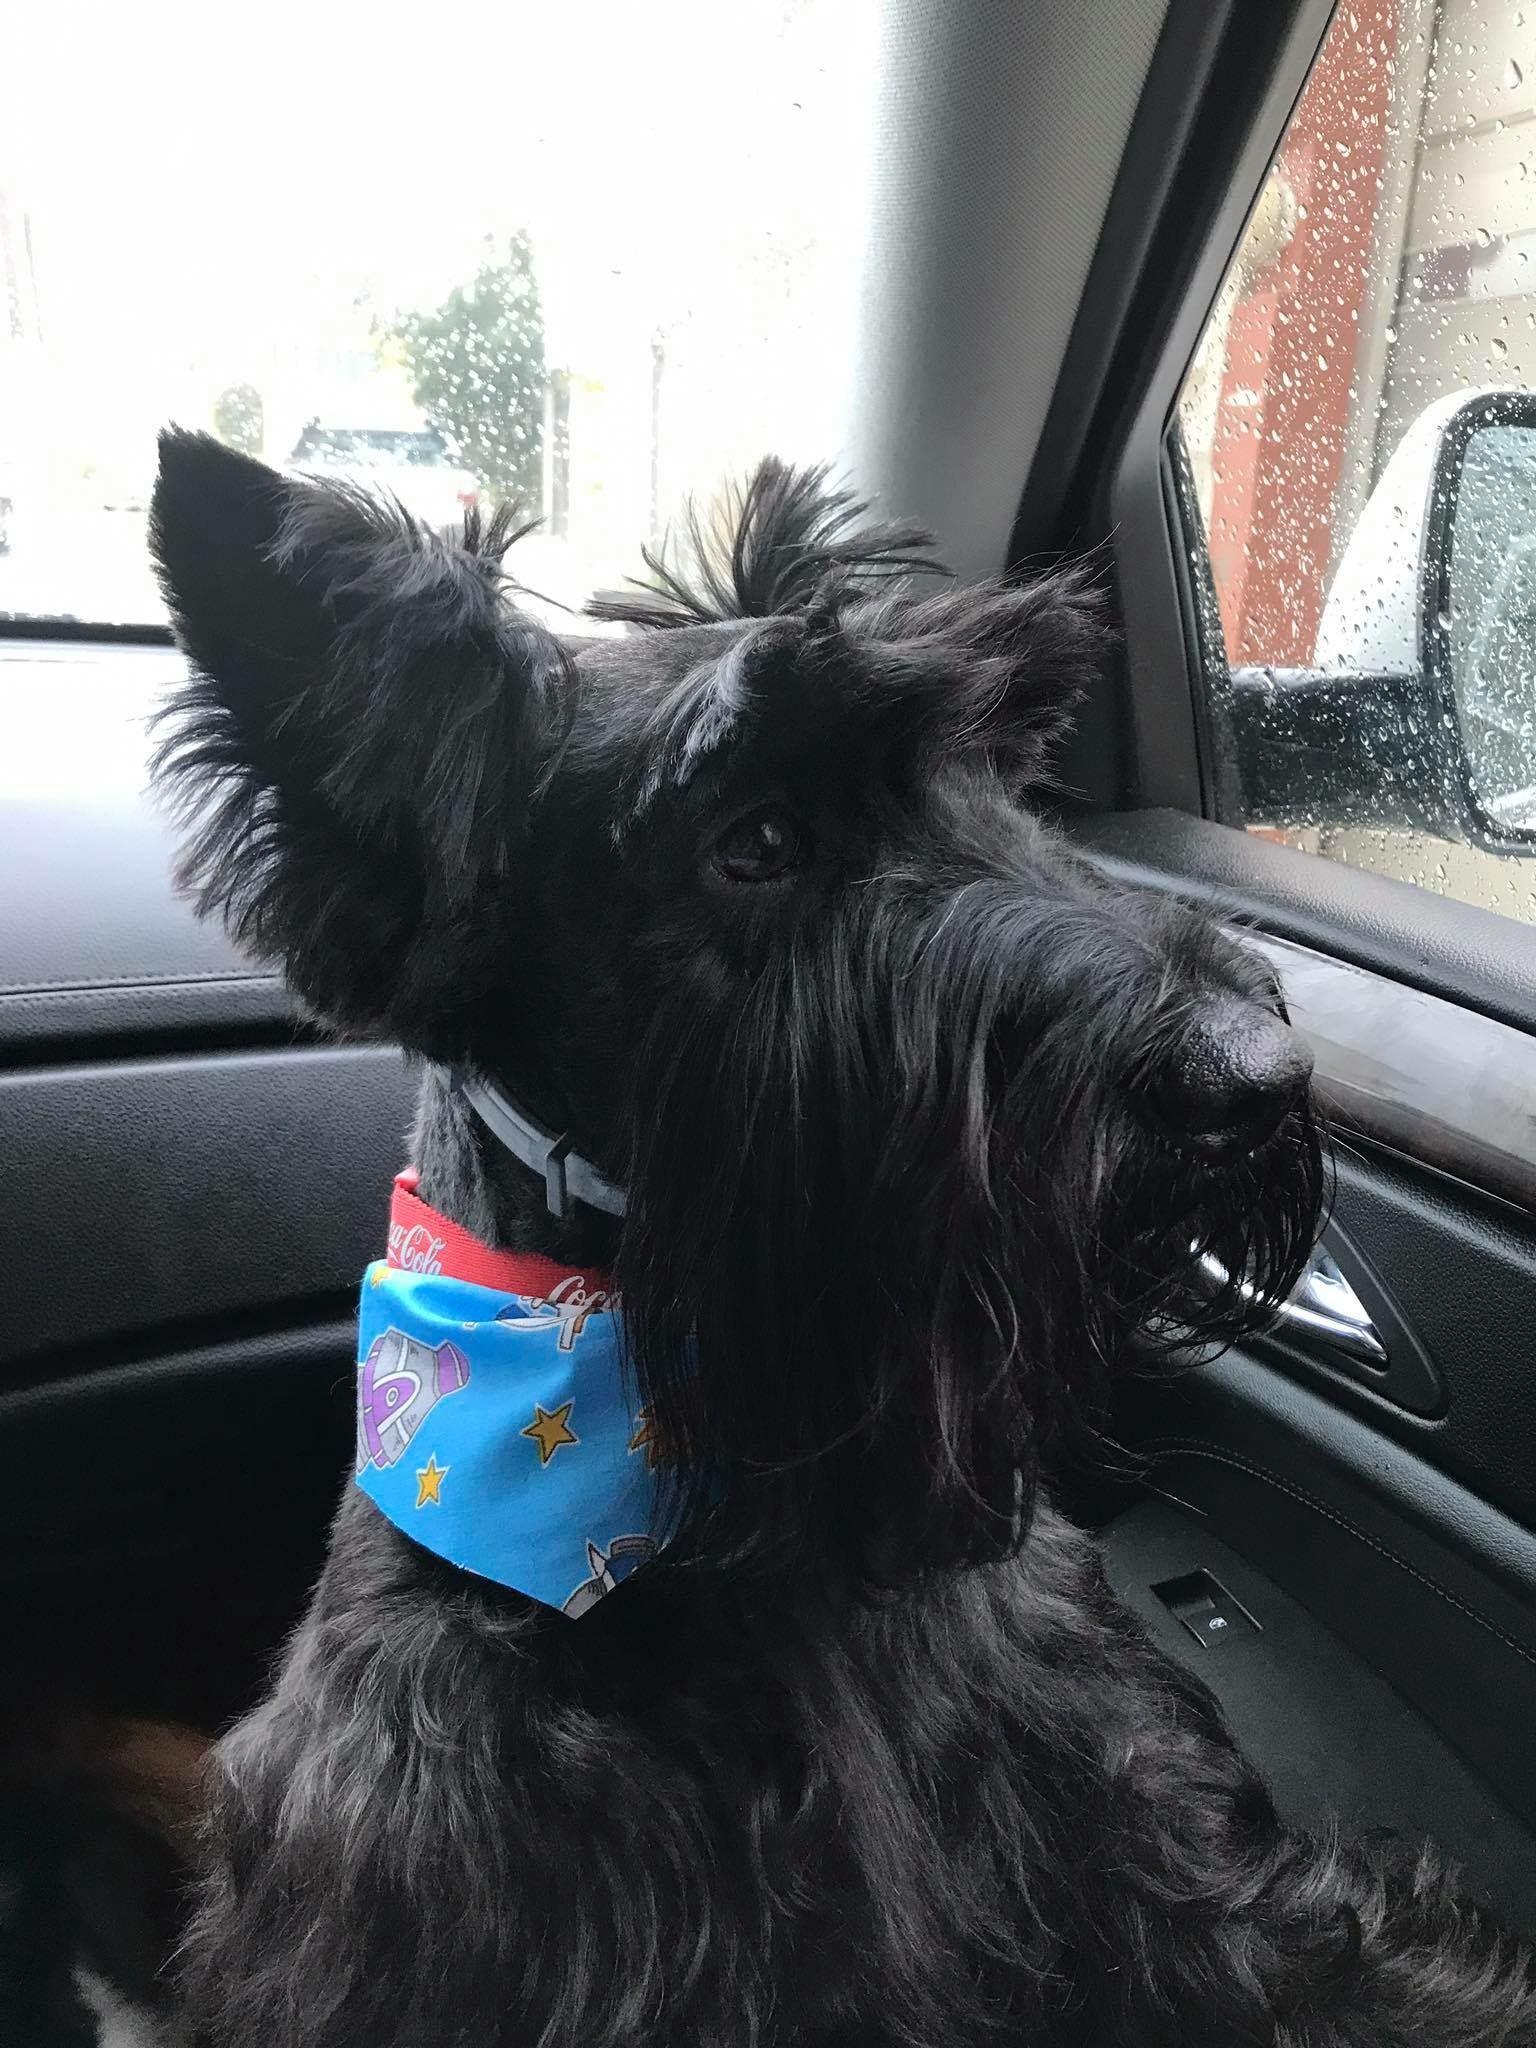 Pantu, scottish terrier, ready for a walk!